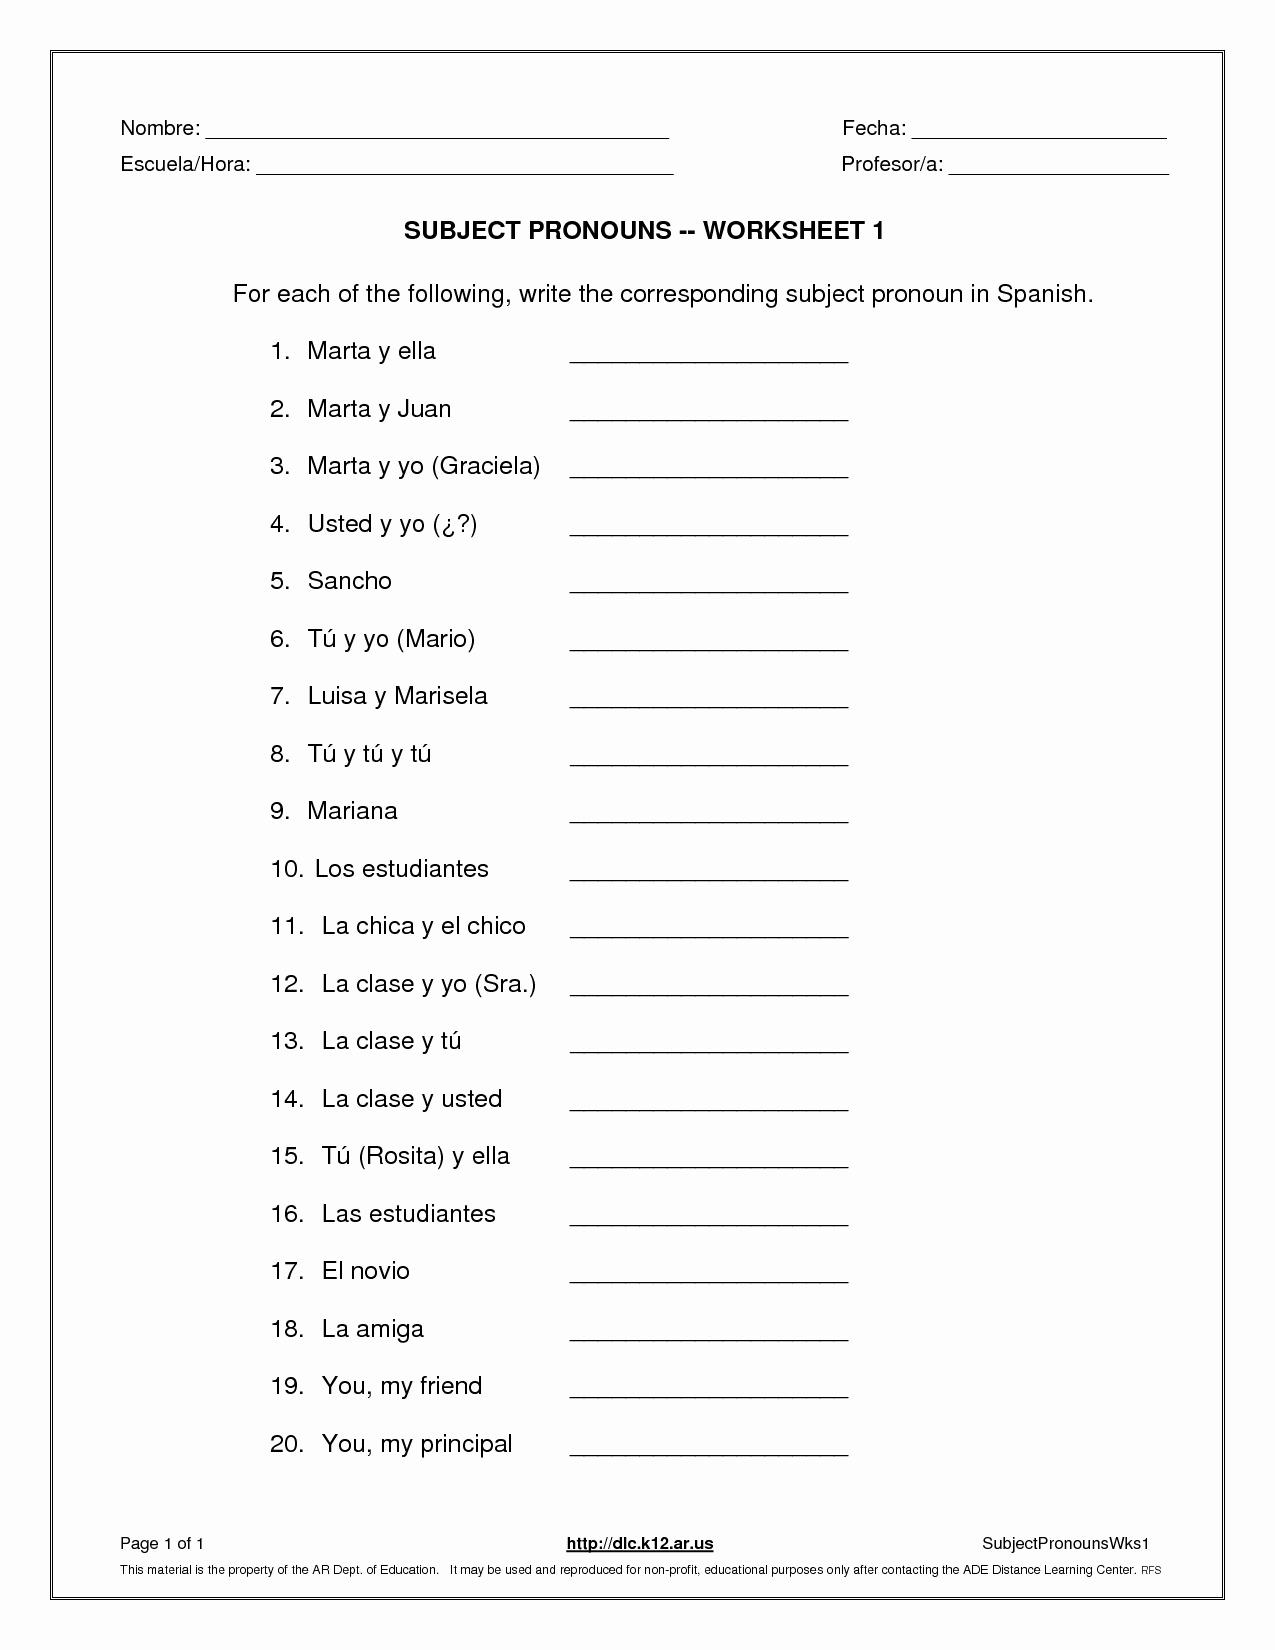 Subject Pronouns In Spanish Worksheet Elegant La Escuela De Ingles De Eva Subject Pronouns Worksheet